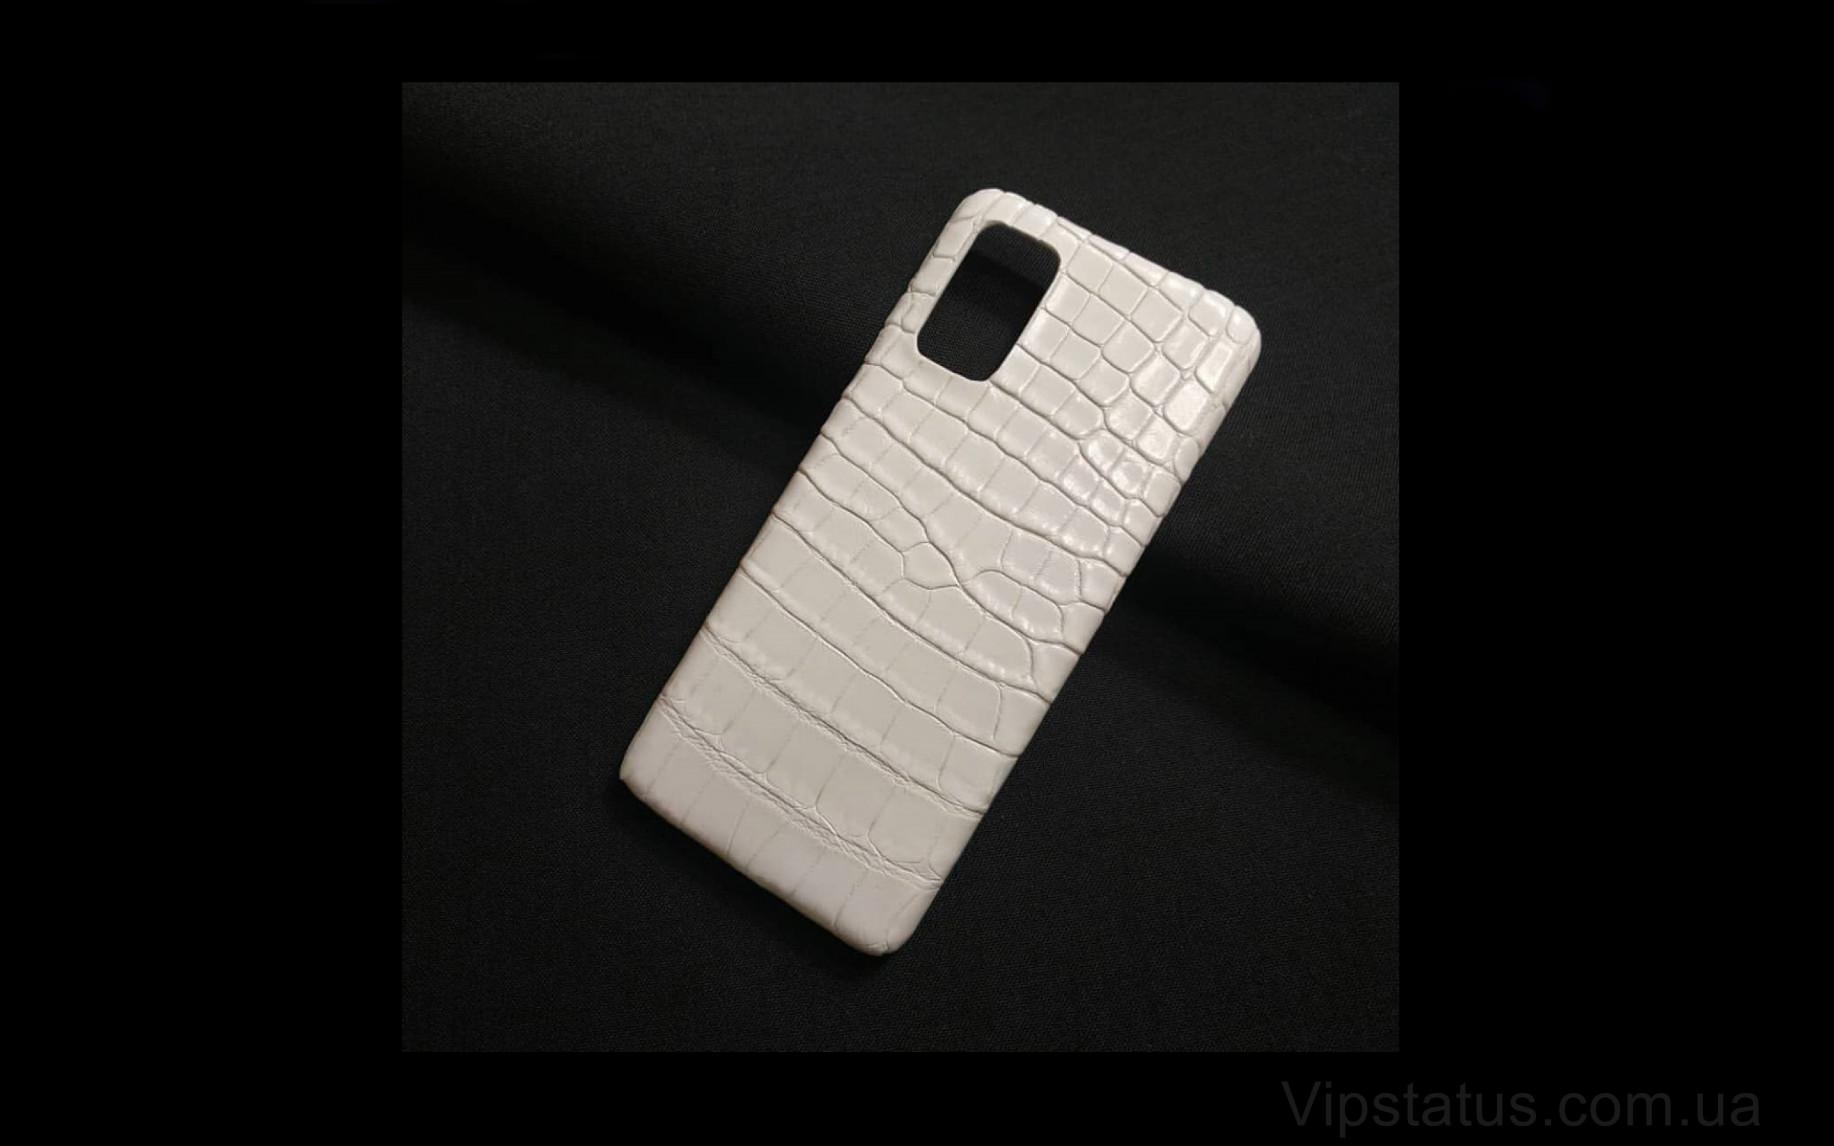 Elite White Style Вип чехол Samsung S20 S21 Plus кожа крокодила White Style Vip case Samsung S20 S21 Plus Crocodile leather image 1